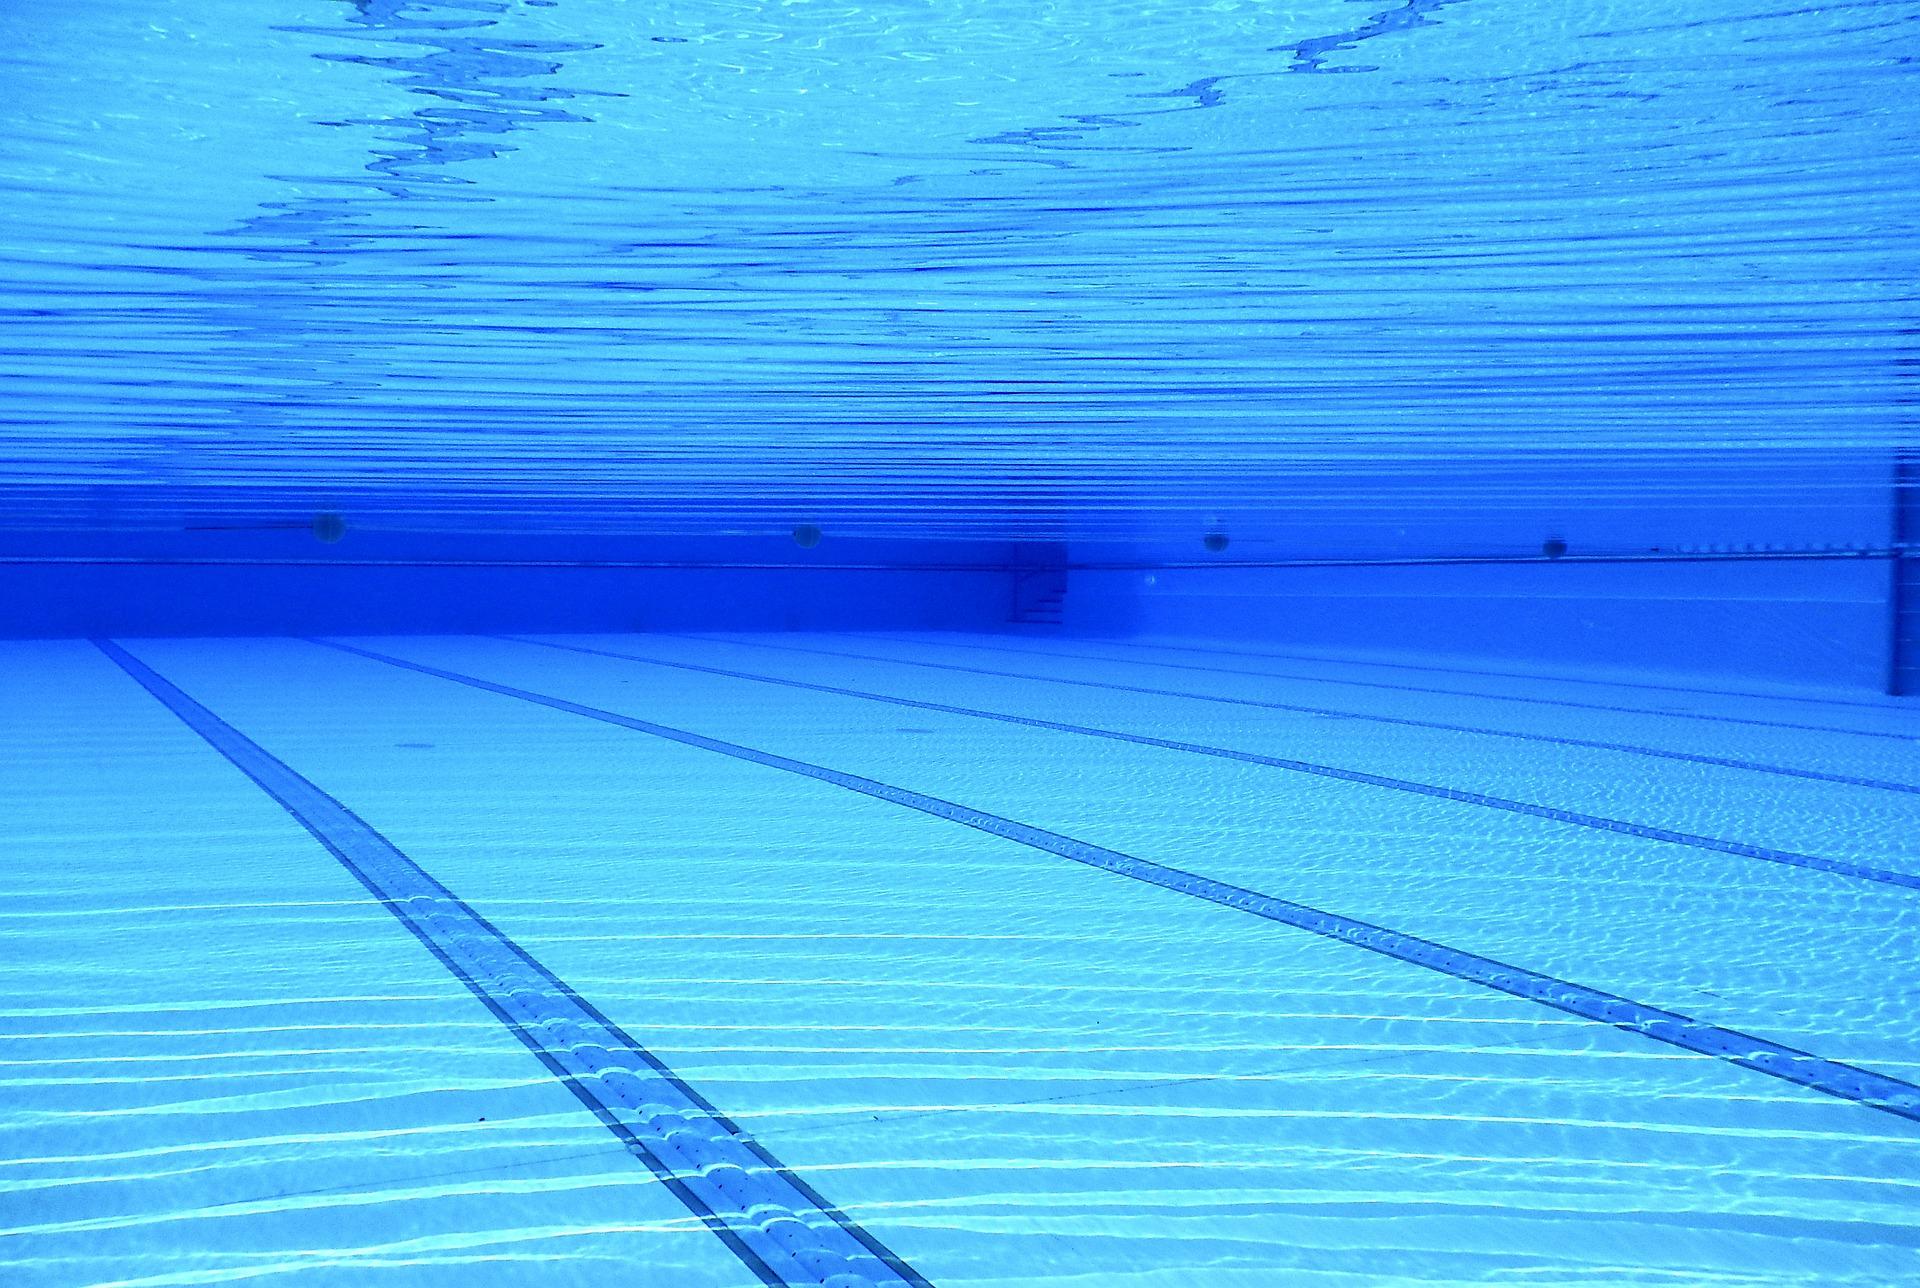 Fond d'une piscine olympique